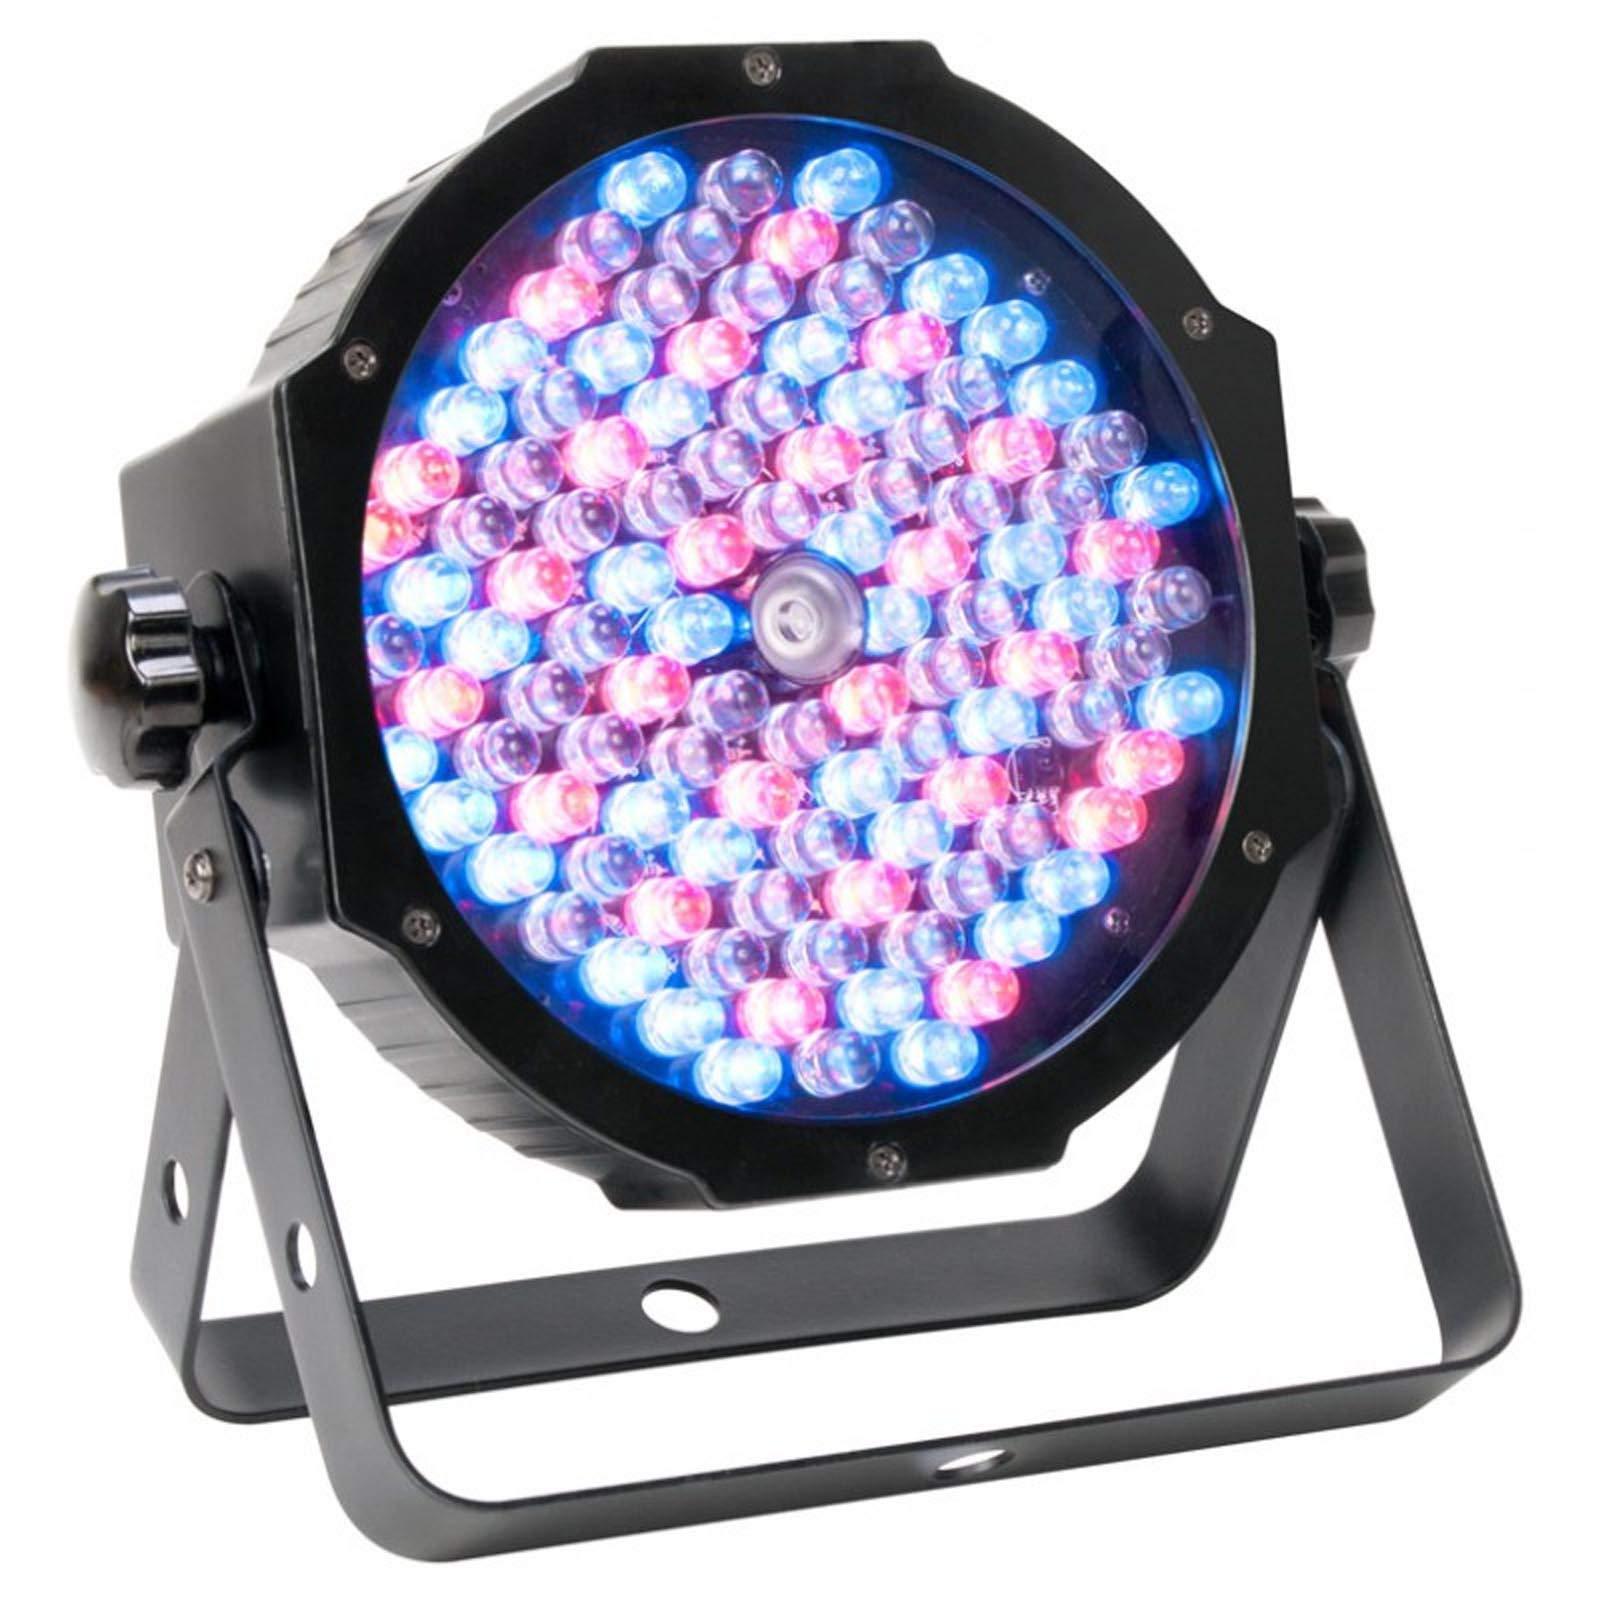 American DJ ADJ Mega Par Profile Plus LED RGB+UV Slim Par Can Wash Effect Light (6 Pack) by ADJ (Image #2)